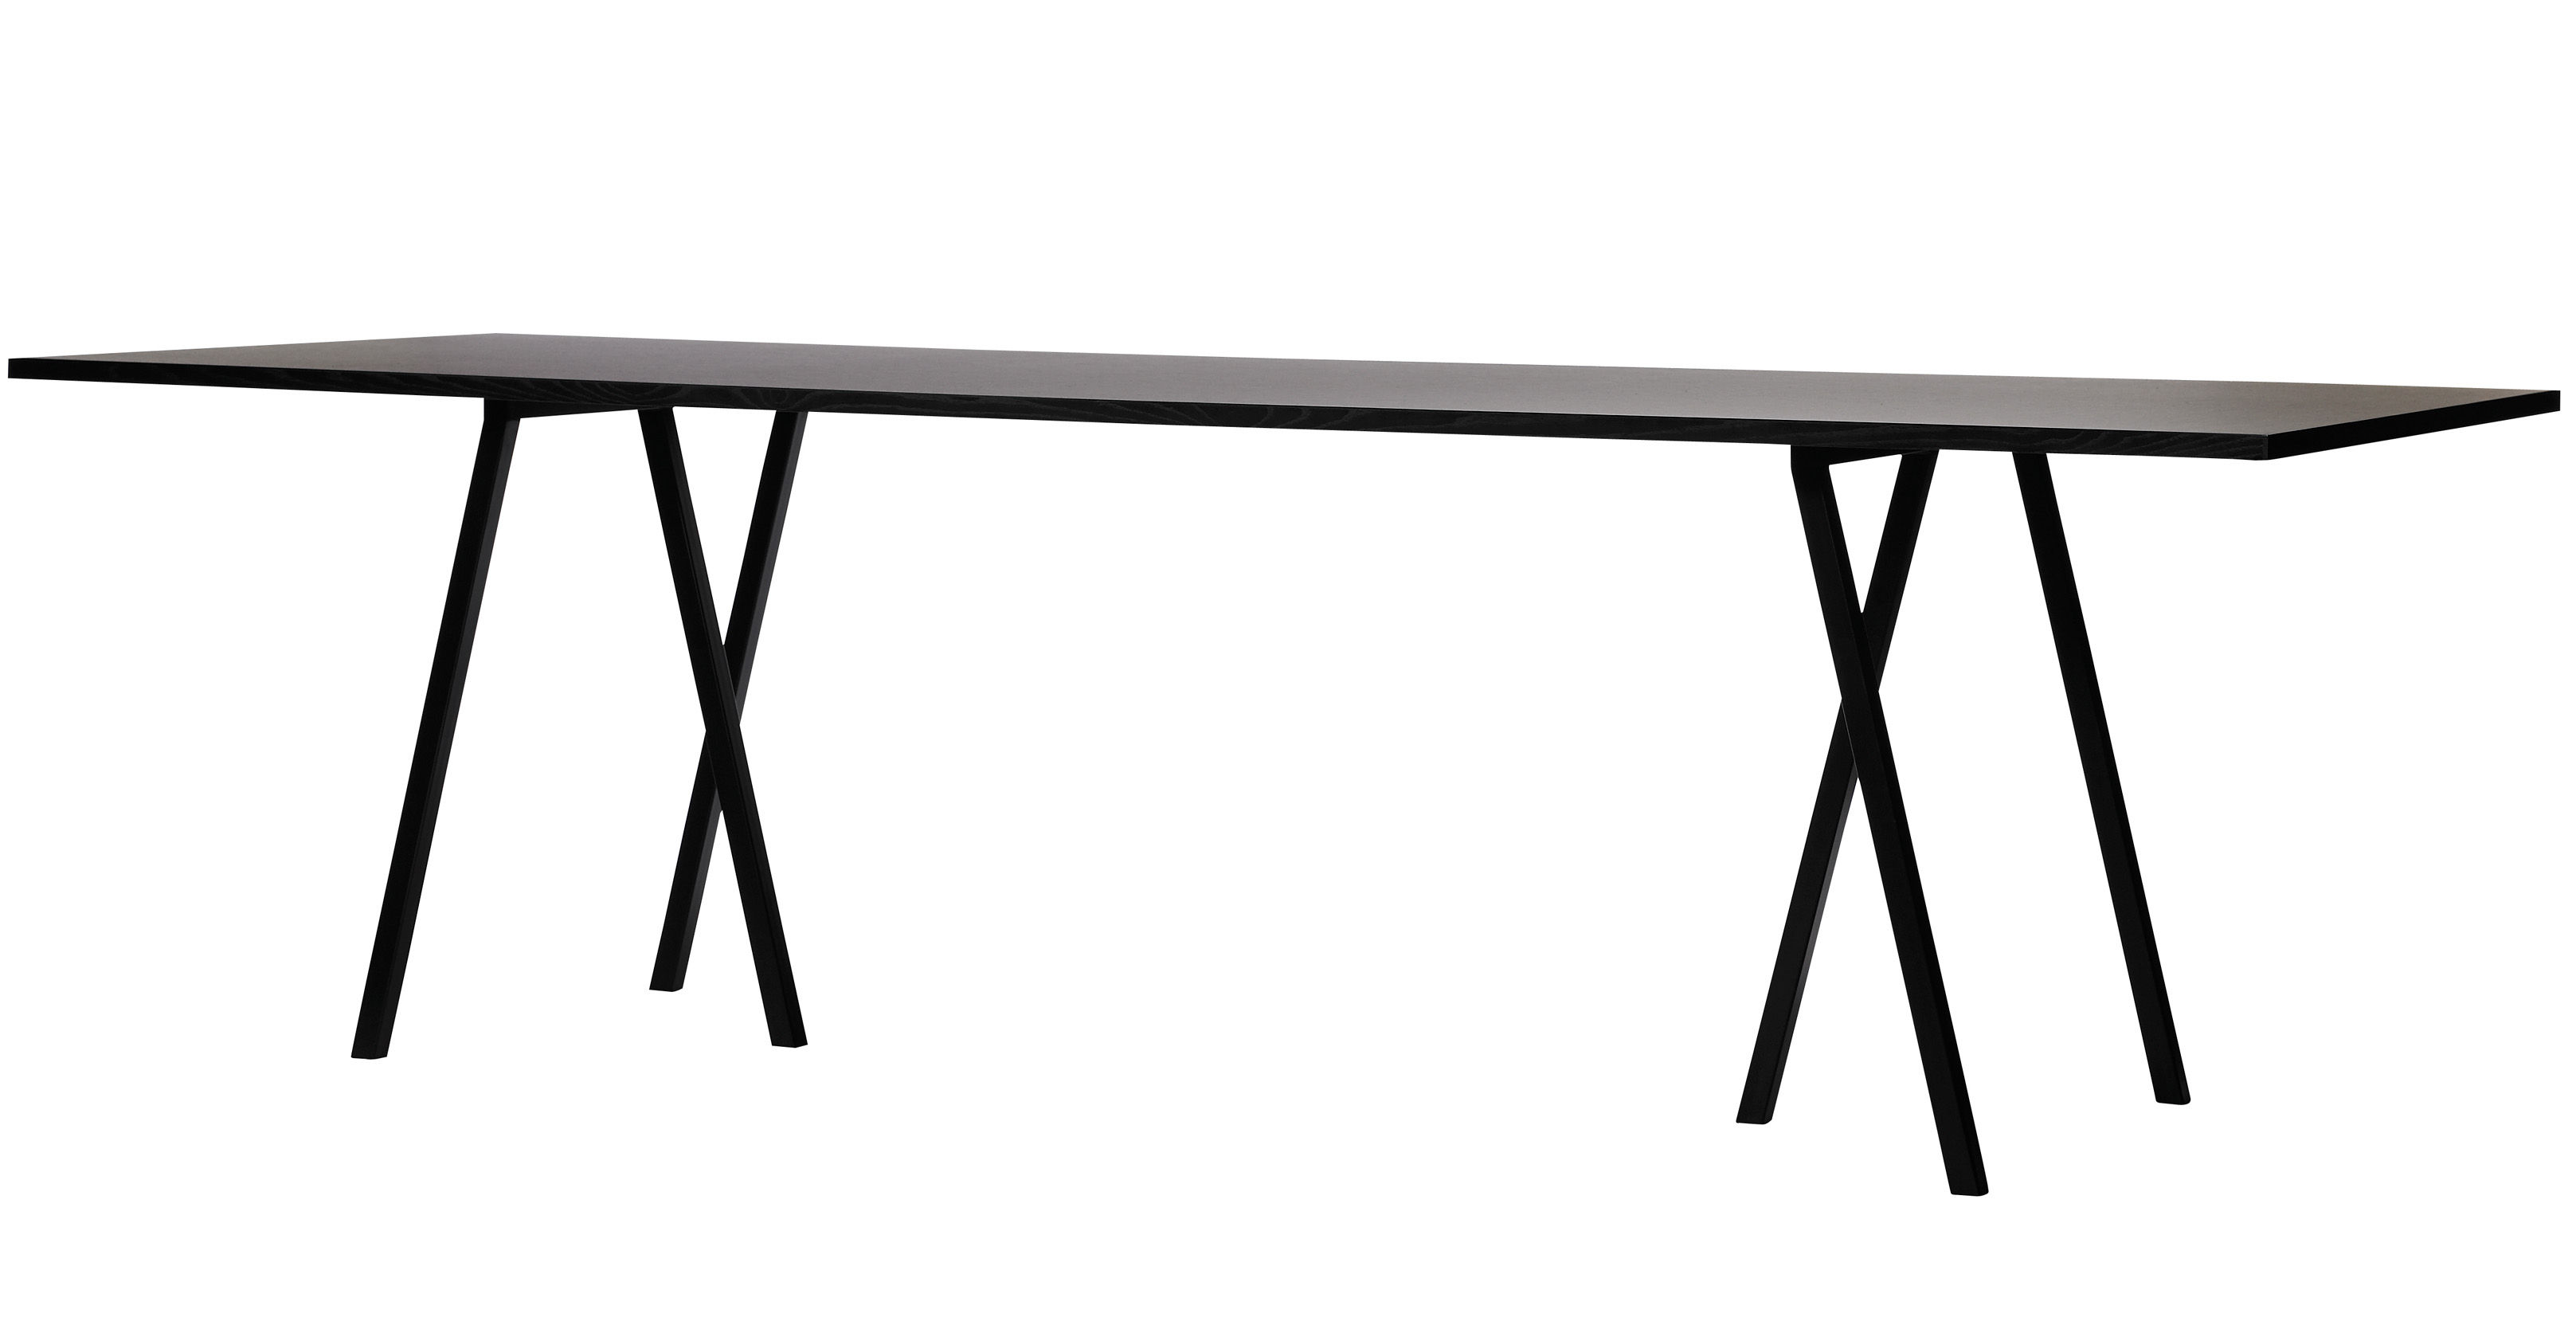 Rentrée 2011 UK - Must-have - Loop rechteckiger Tisch B 180 cm - Hay - L 180 cm - schwarz - lackierter Stahl